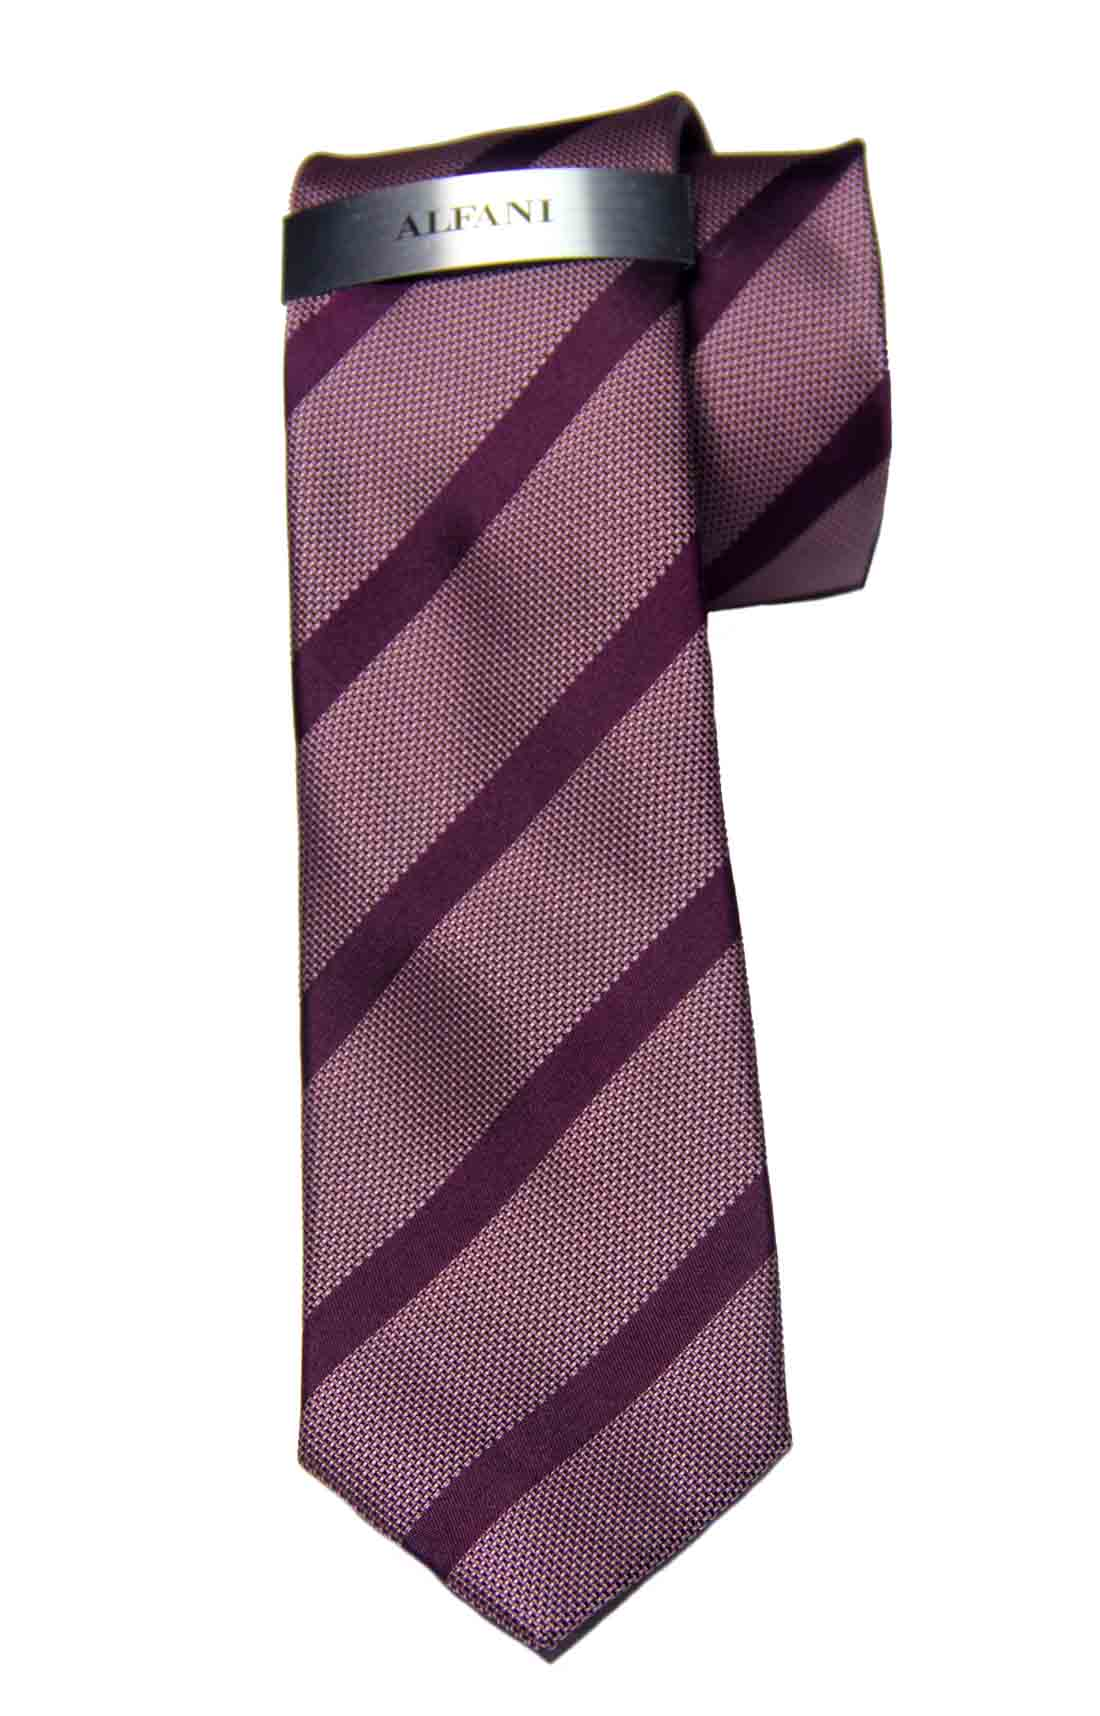 Alfani Hawks Stripe Tie Purple Silk Blend Narrow Men's